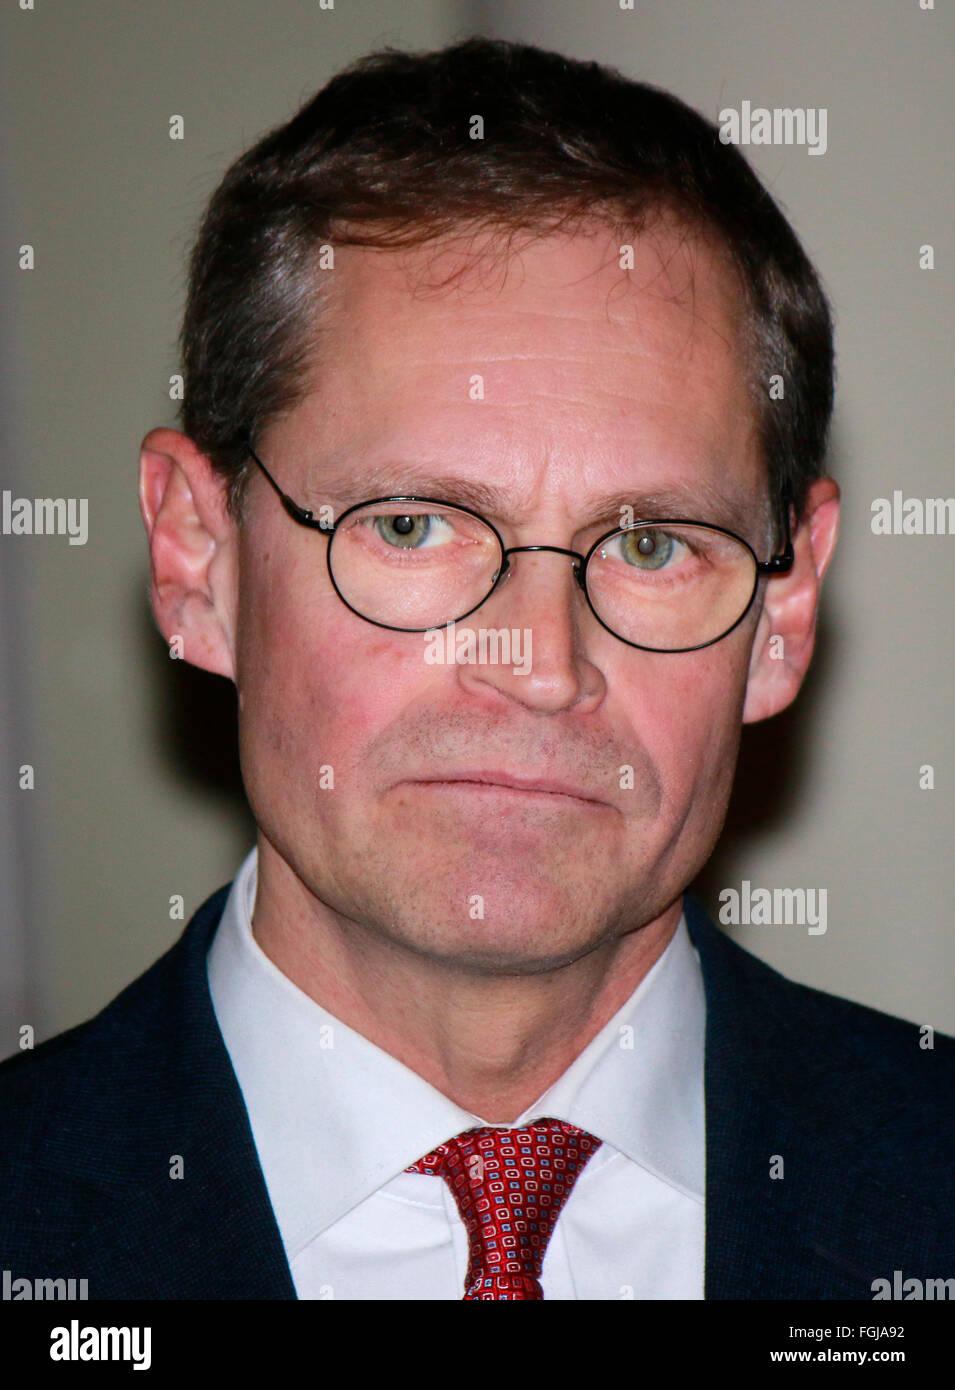 Michael Mueller - Empfang der Berlinale Jury beim Regierenden Buergermeister, Rotes Rathaus, 17. Februar 2016, Berlin. - Stock Image